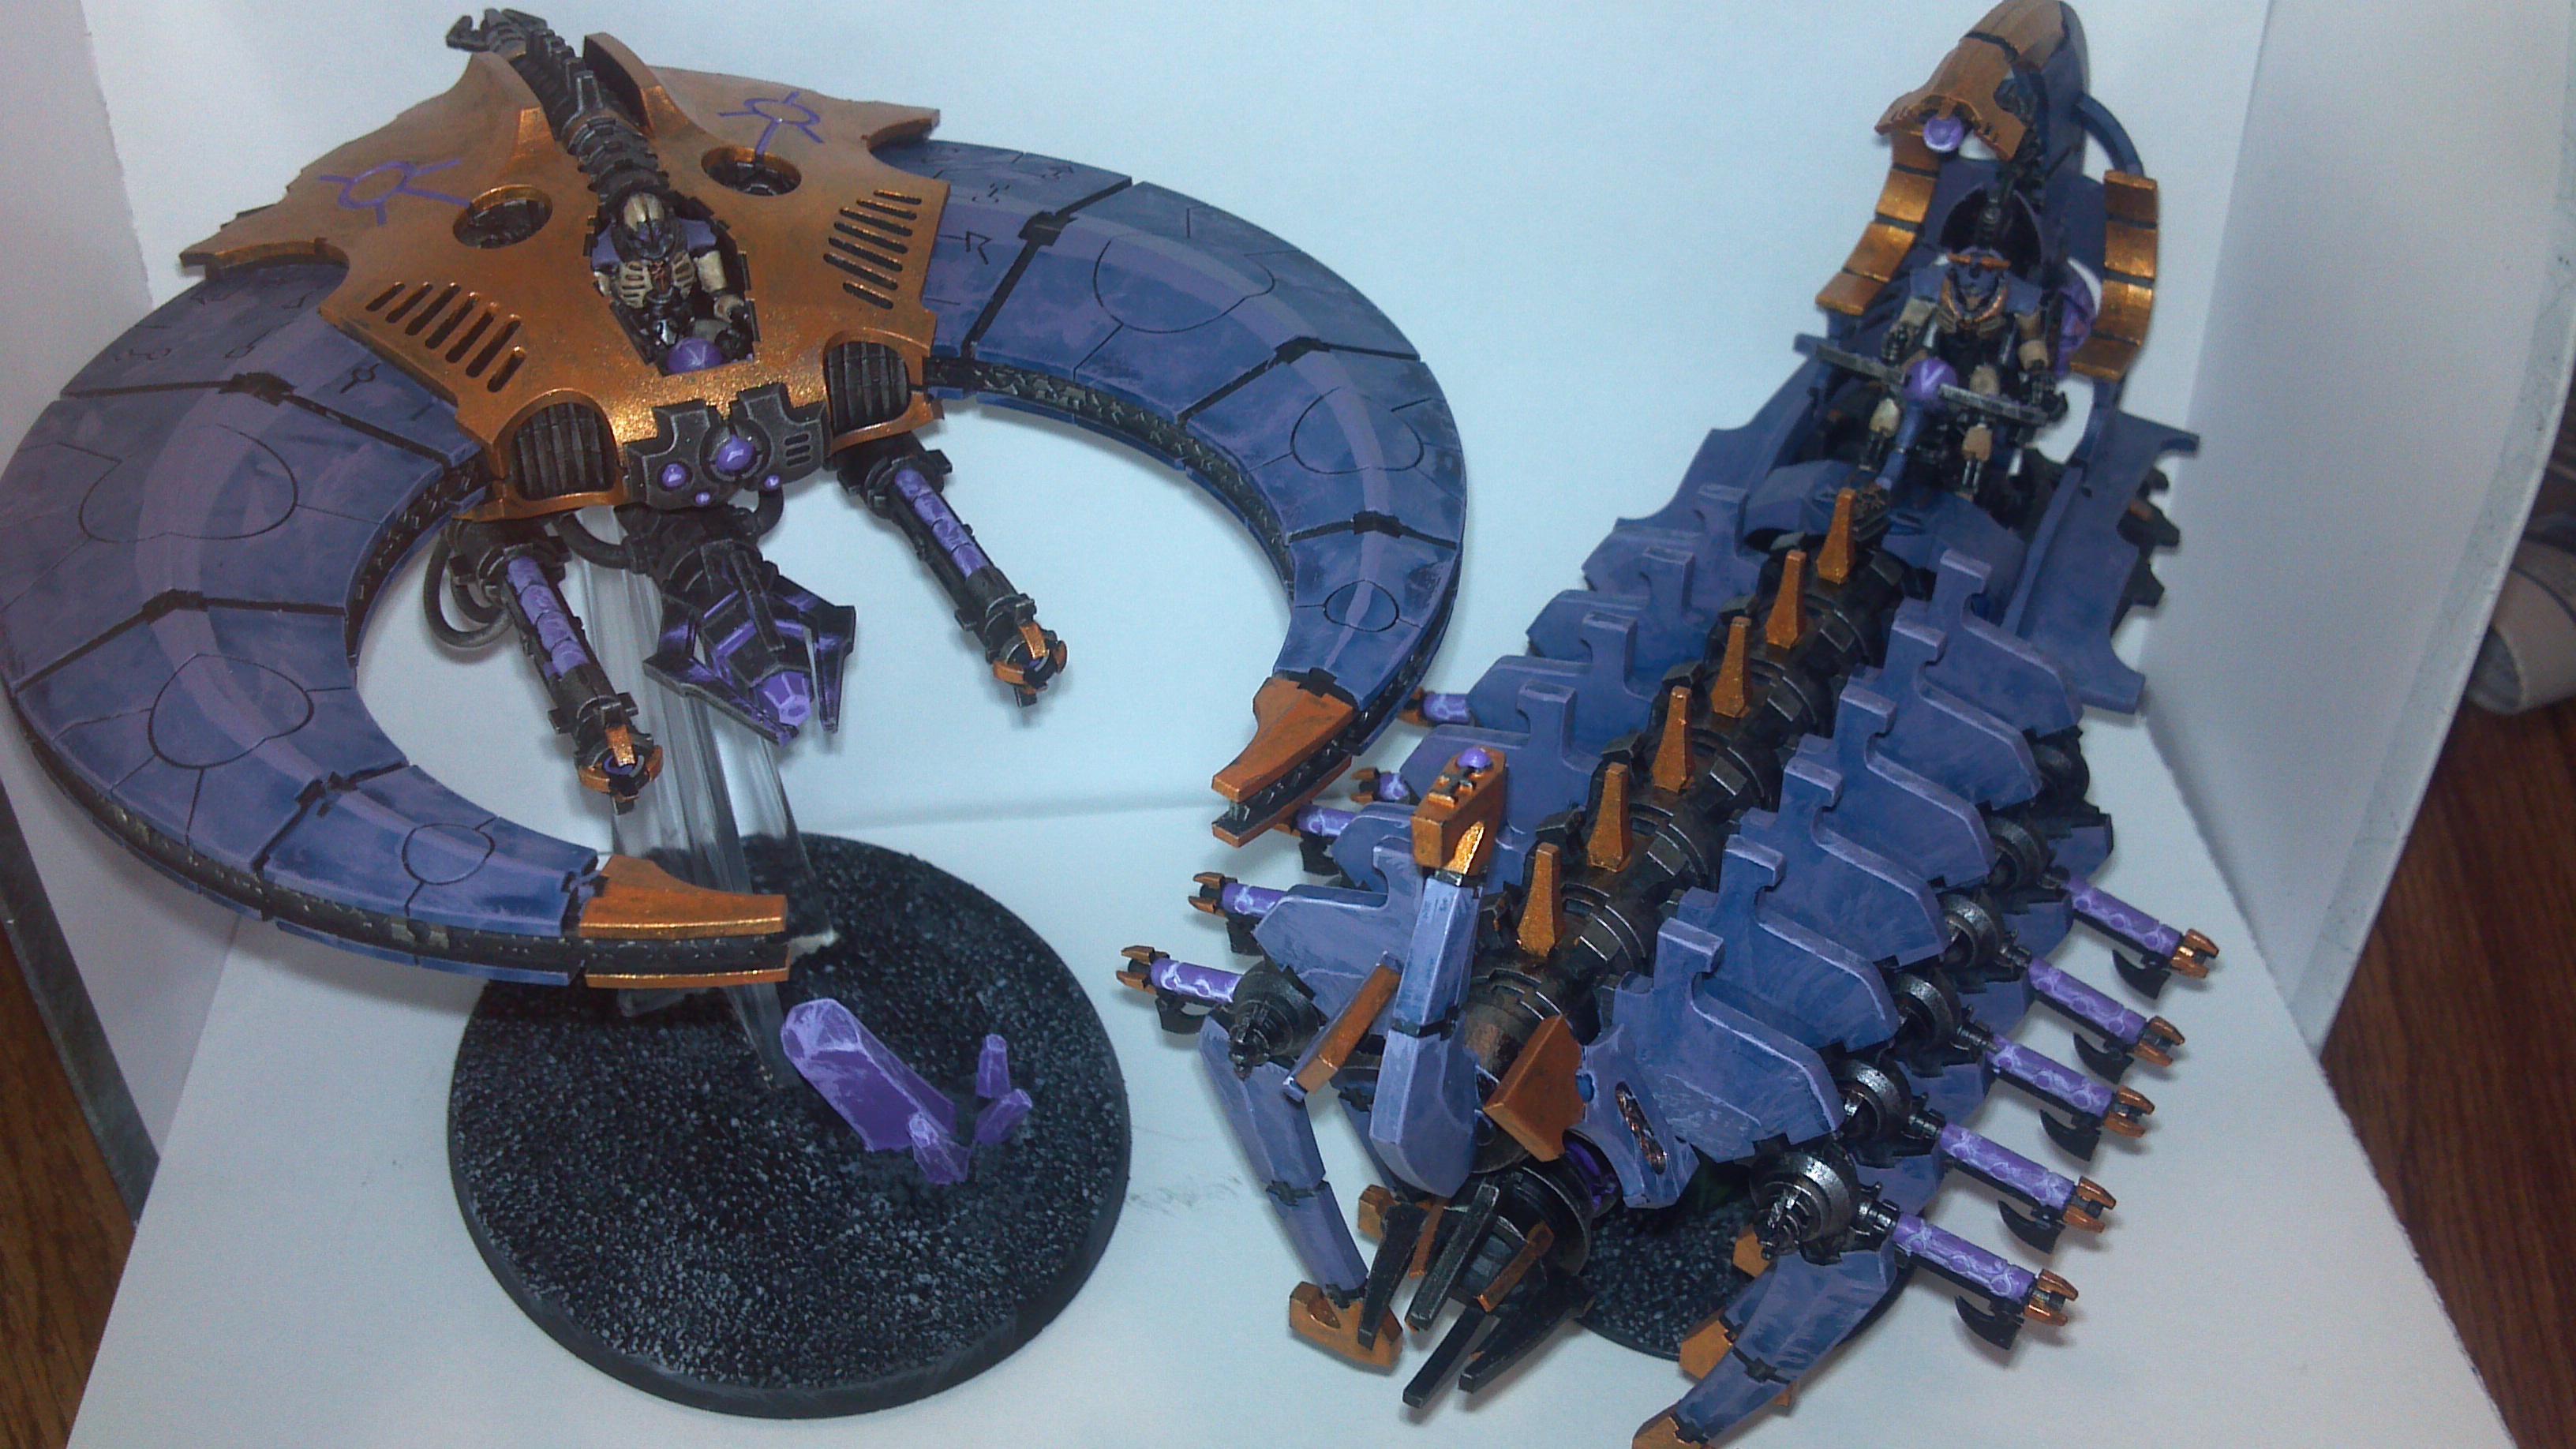 Canoptec, Doomscythe, Doomsday Arc, Necrons, Scarabs, Spider, Warriors, Wraith